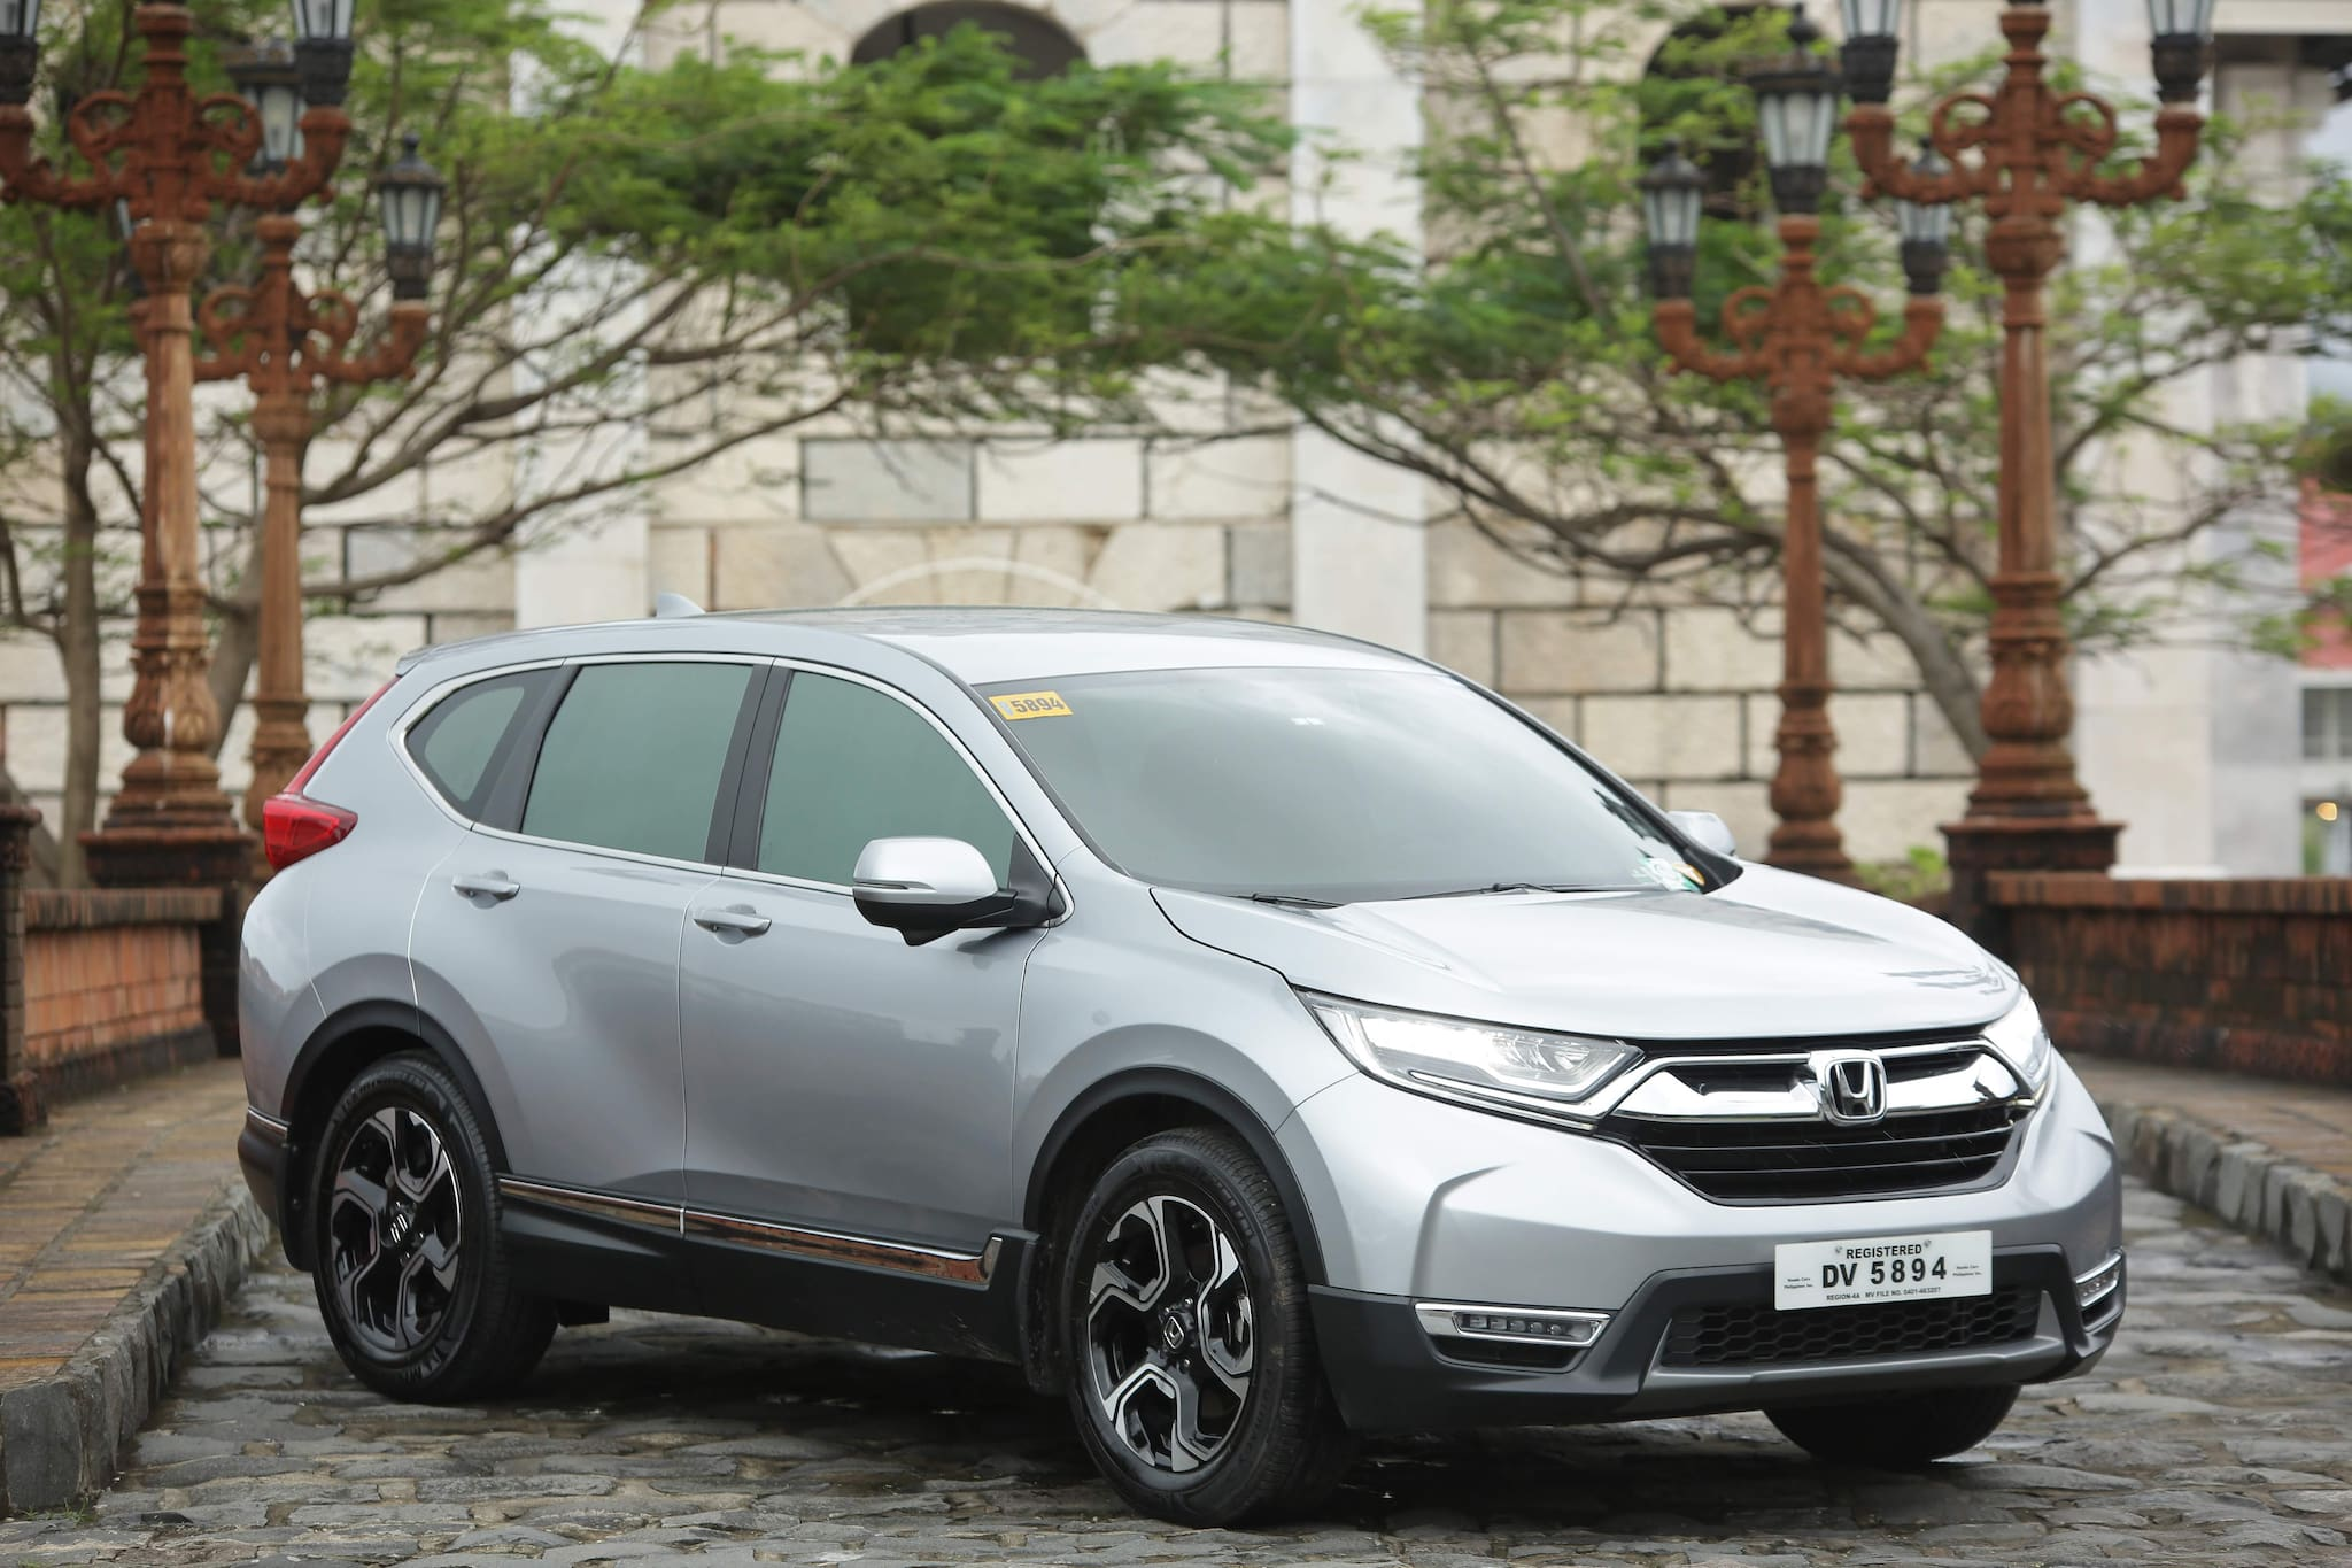 Honda CR-V 2018: First Drive Review